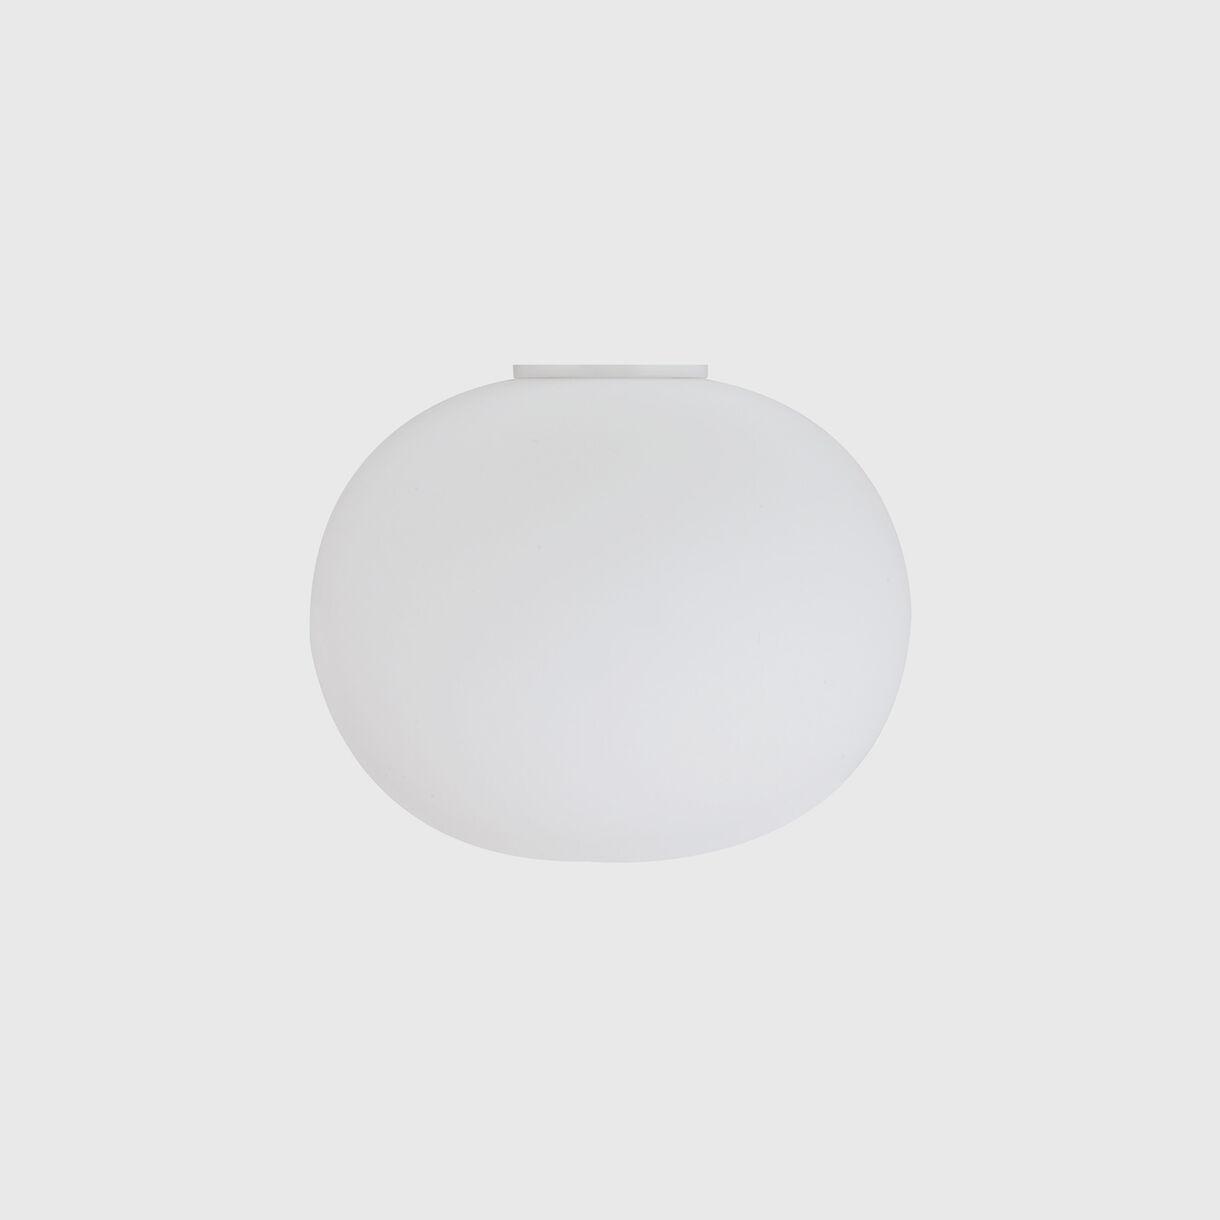 Glo-Ball Ceiling Lamp C1